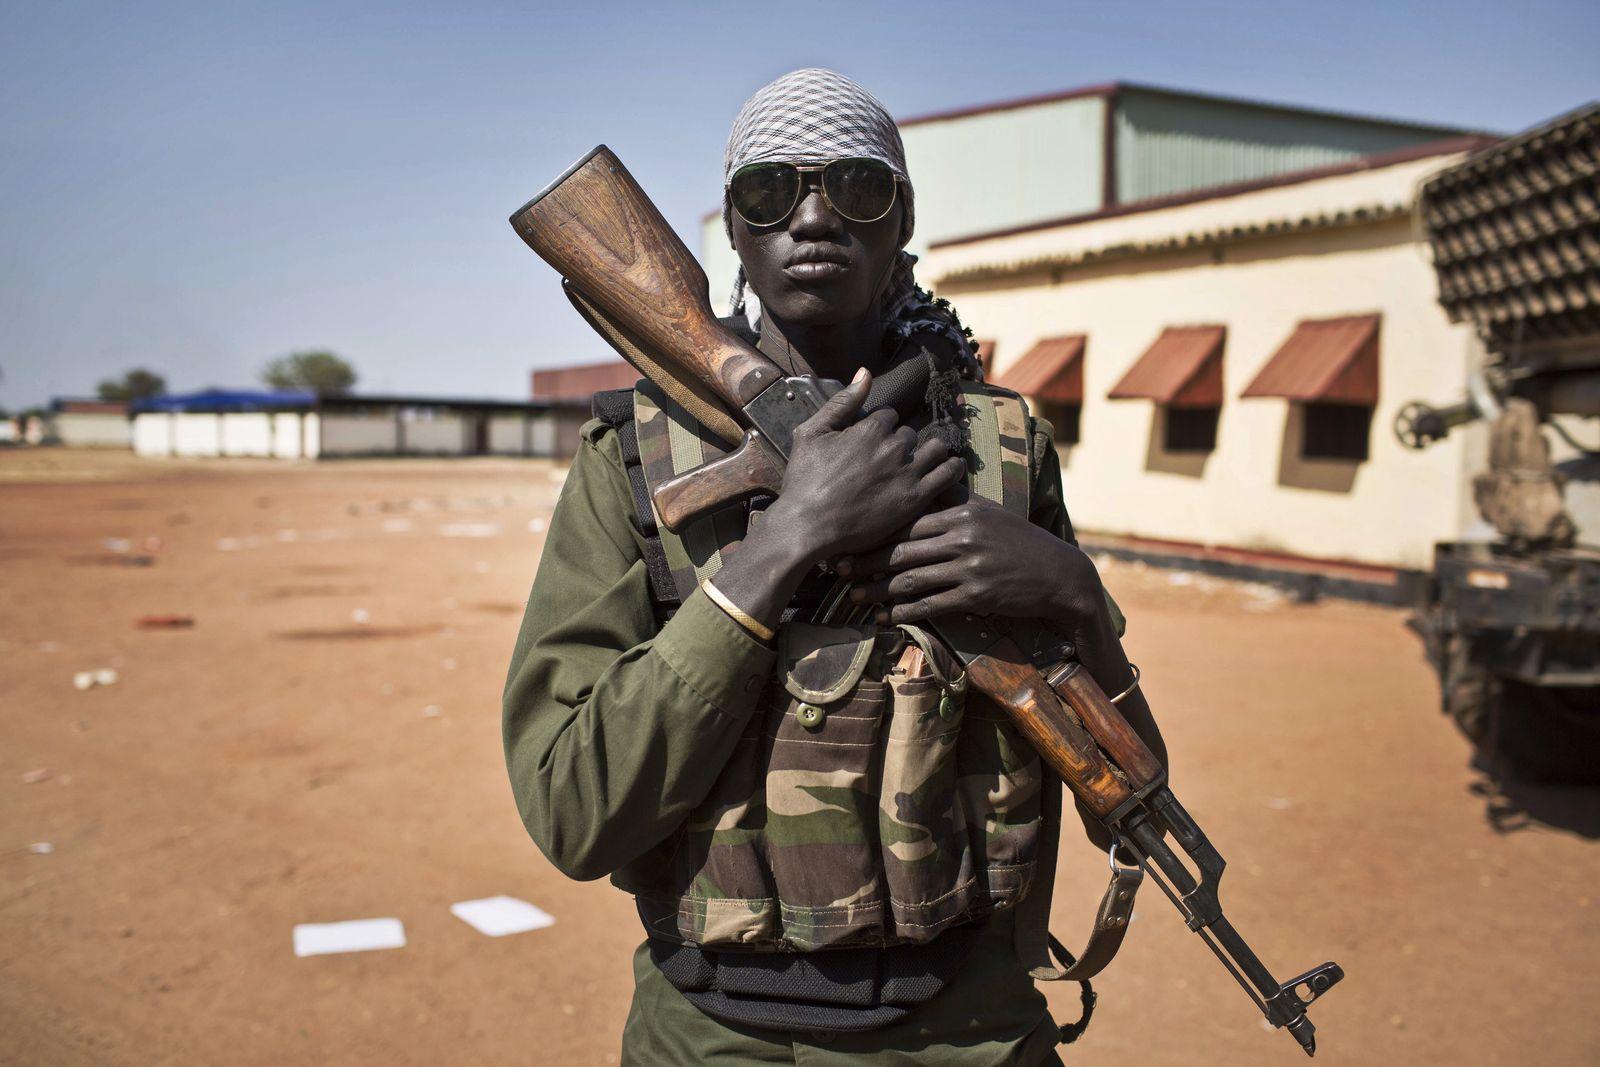 Südsudan / Soldat